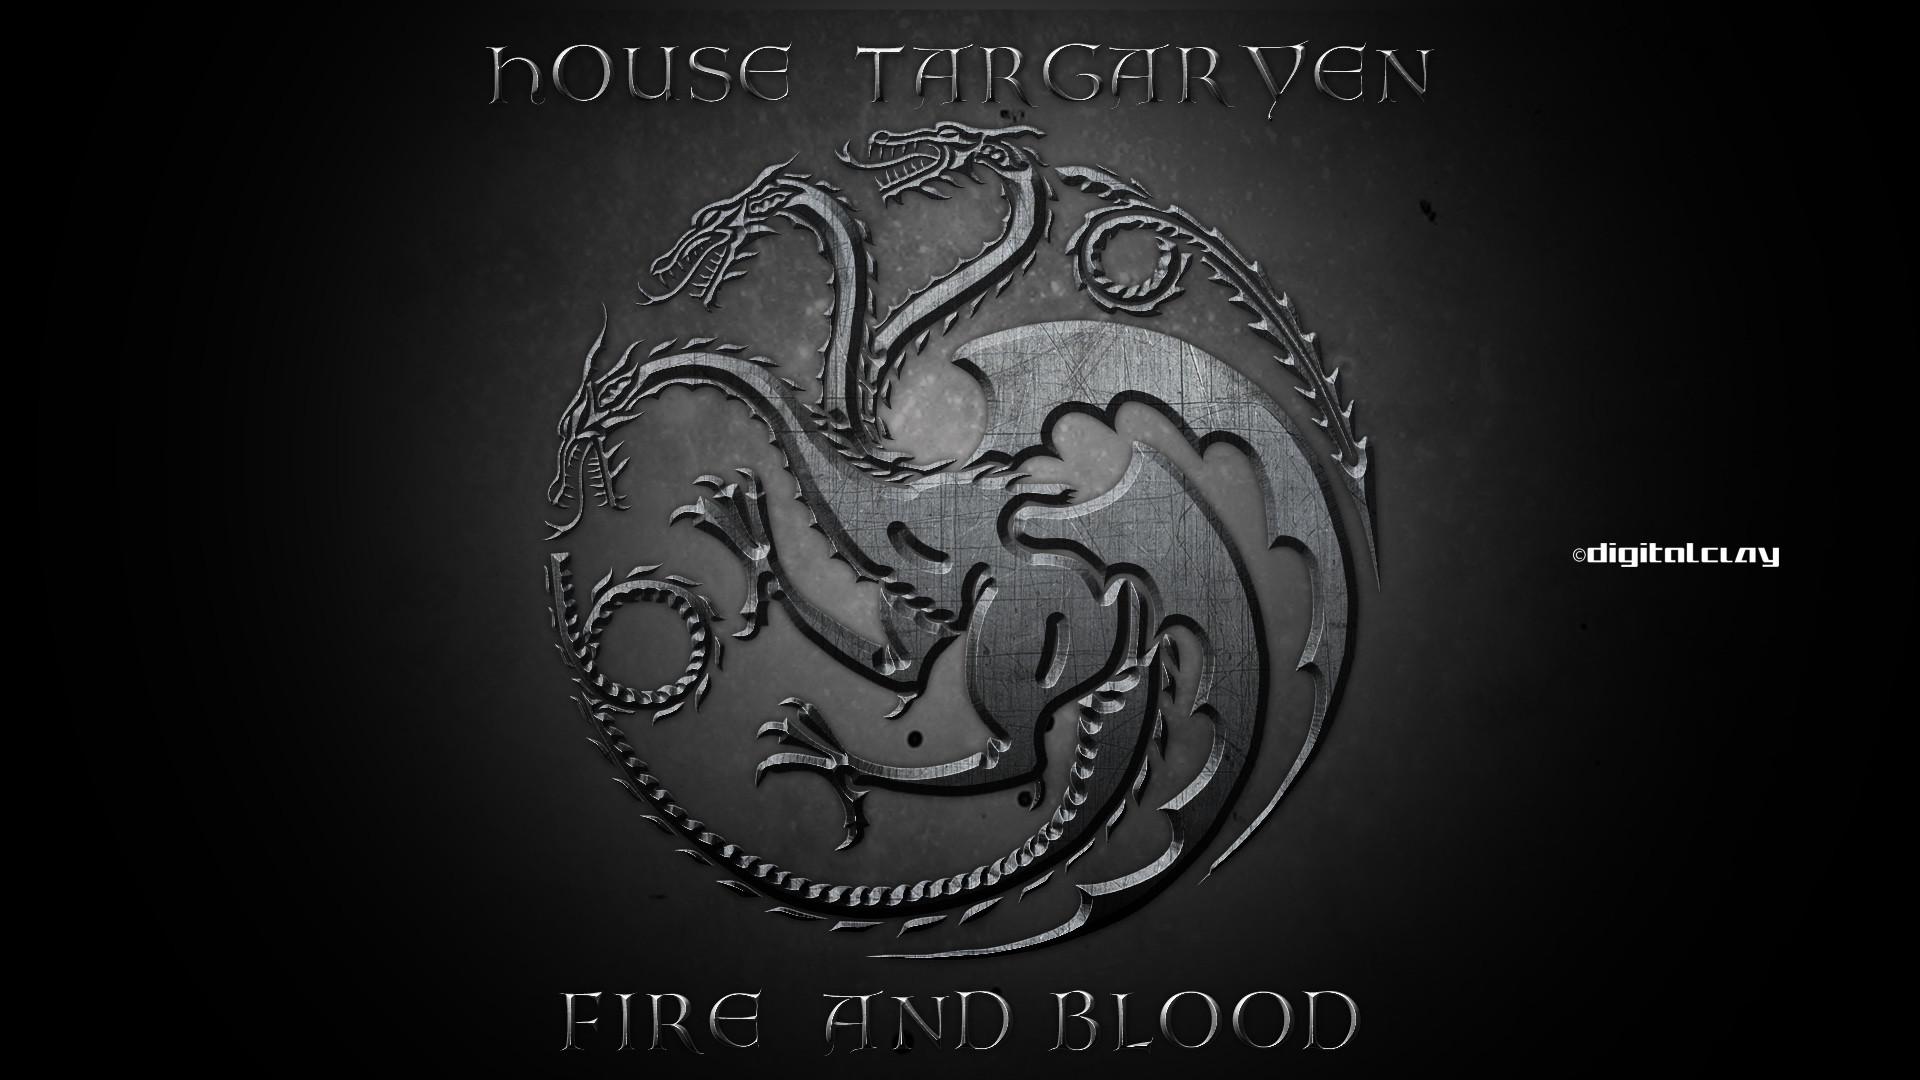 … mrminutuslausus House Targaryen Banner type 2 by mrminutuslausus